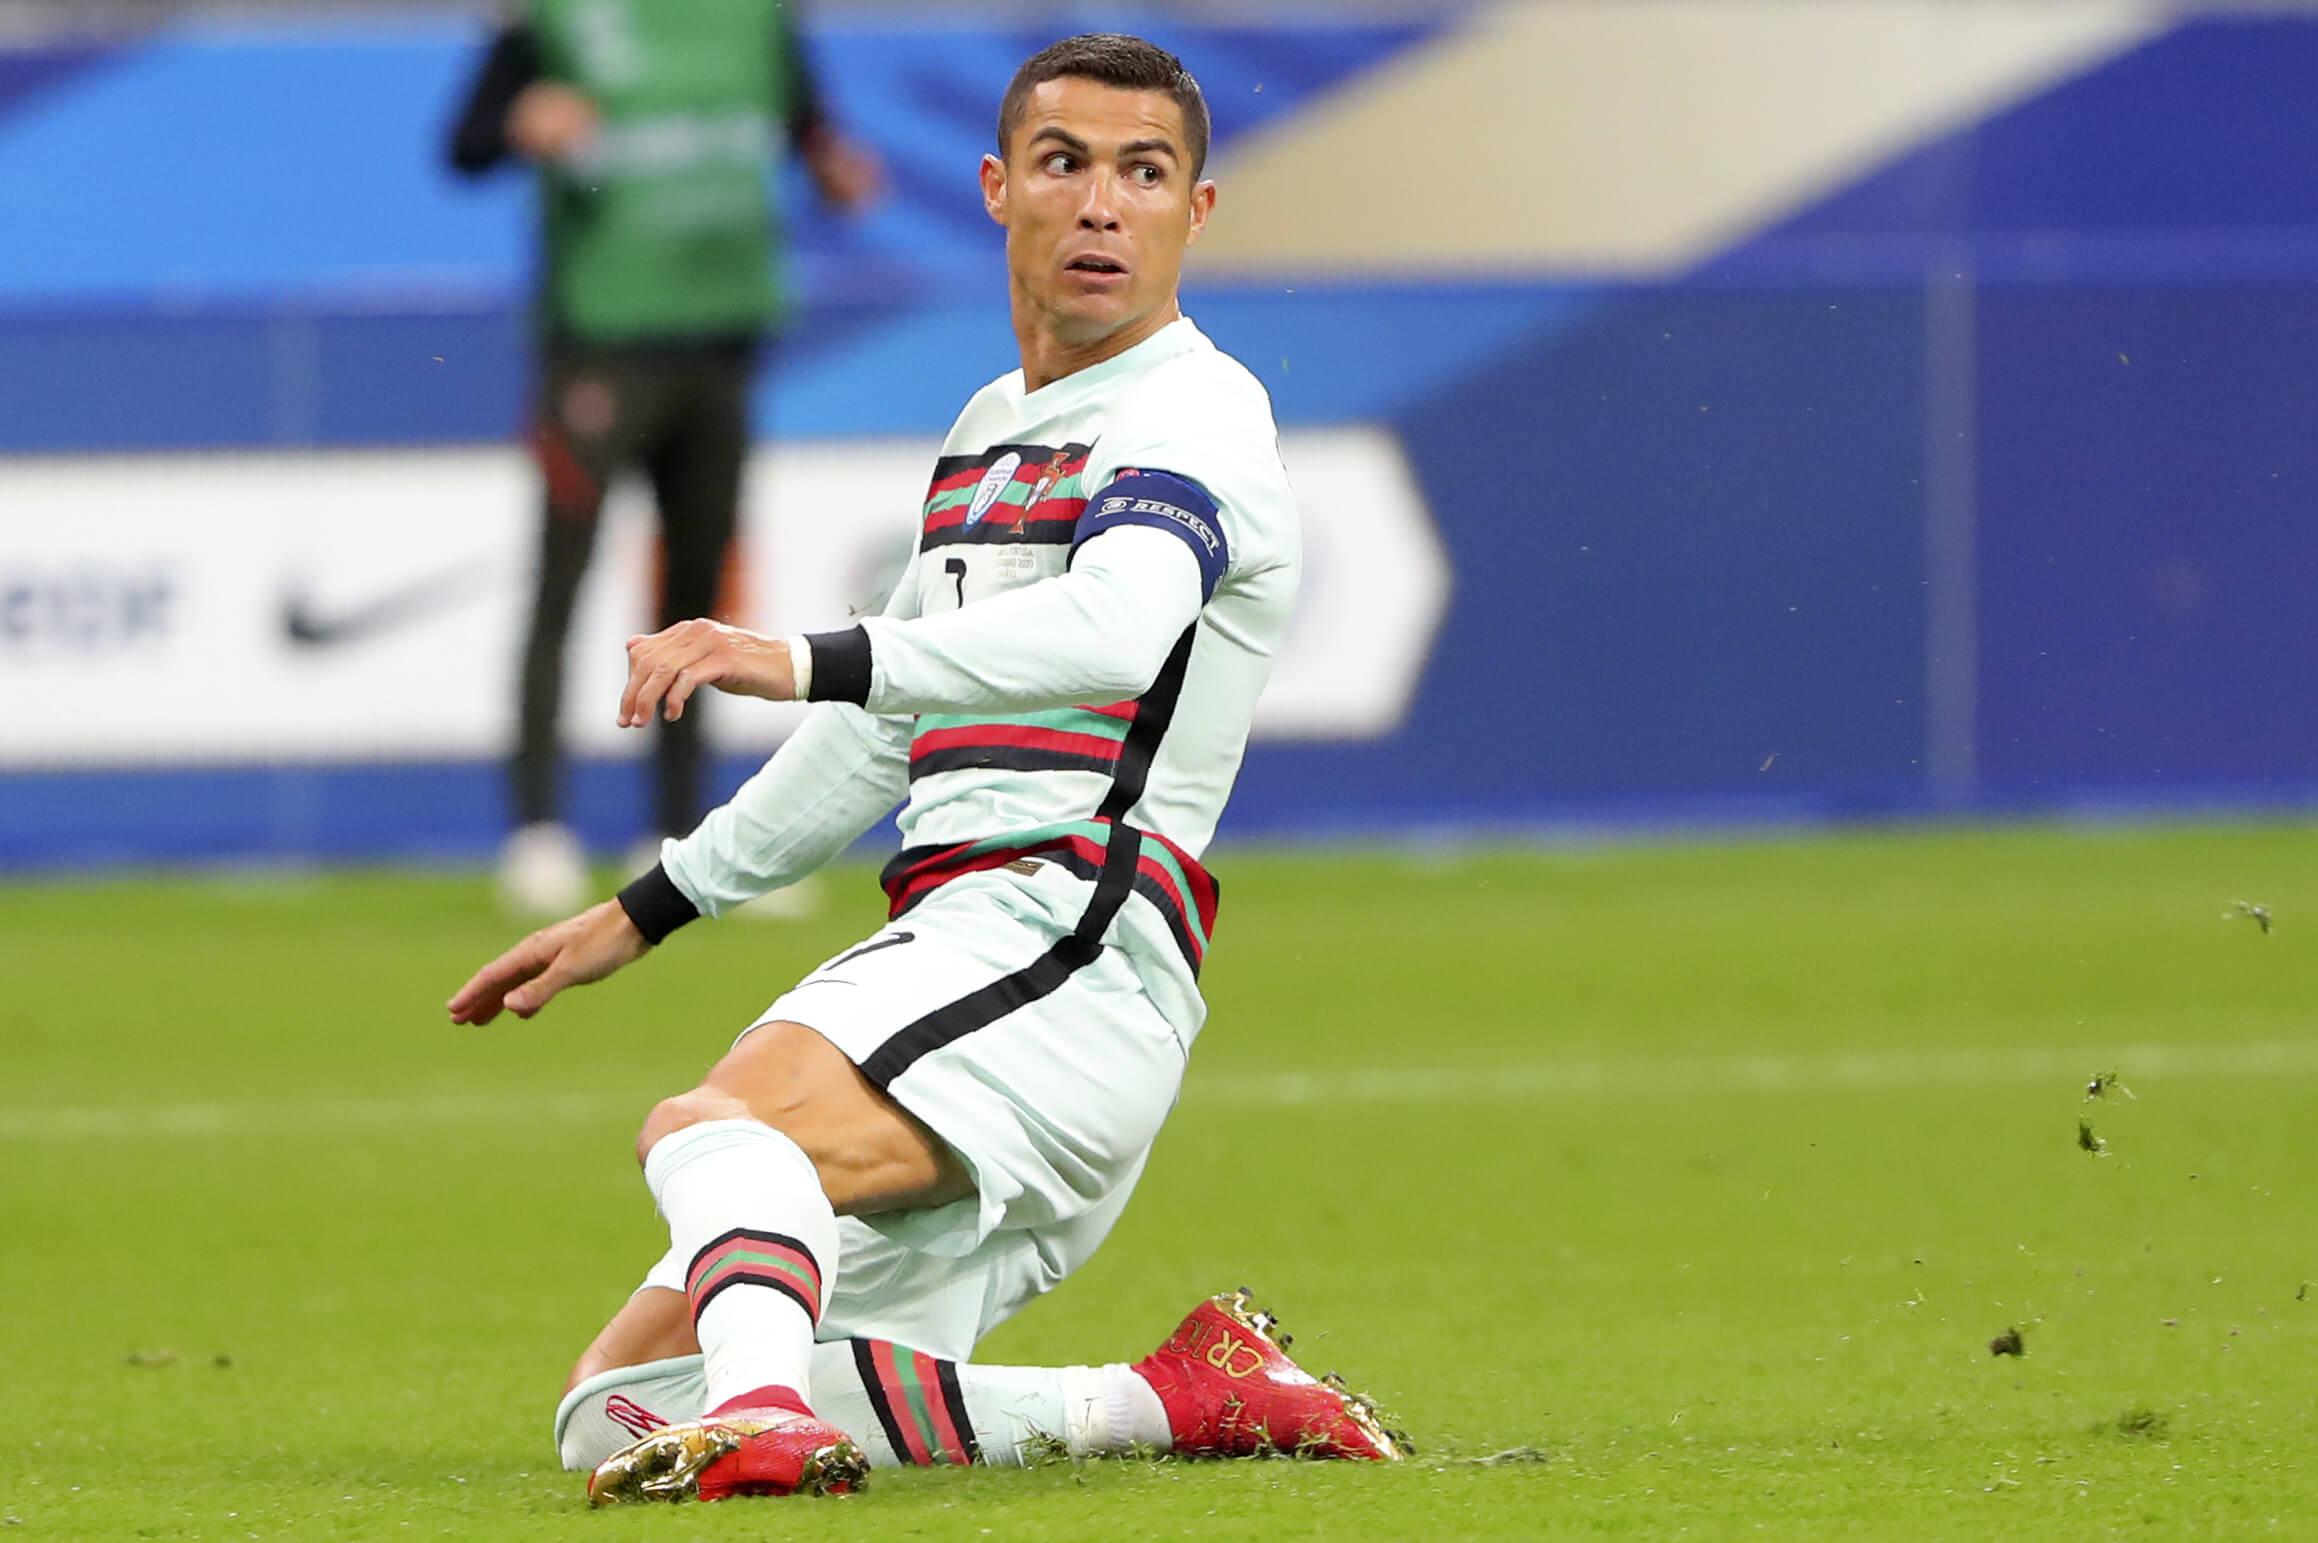 Cristiano Ronaldo tests COVID-19 positive, to go for self-isolation